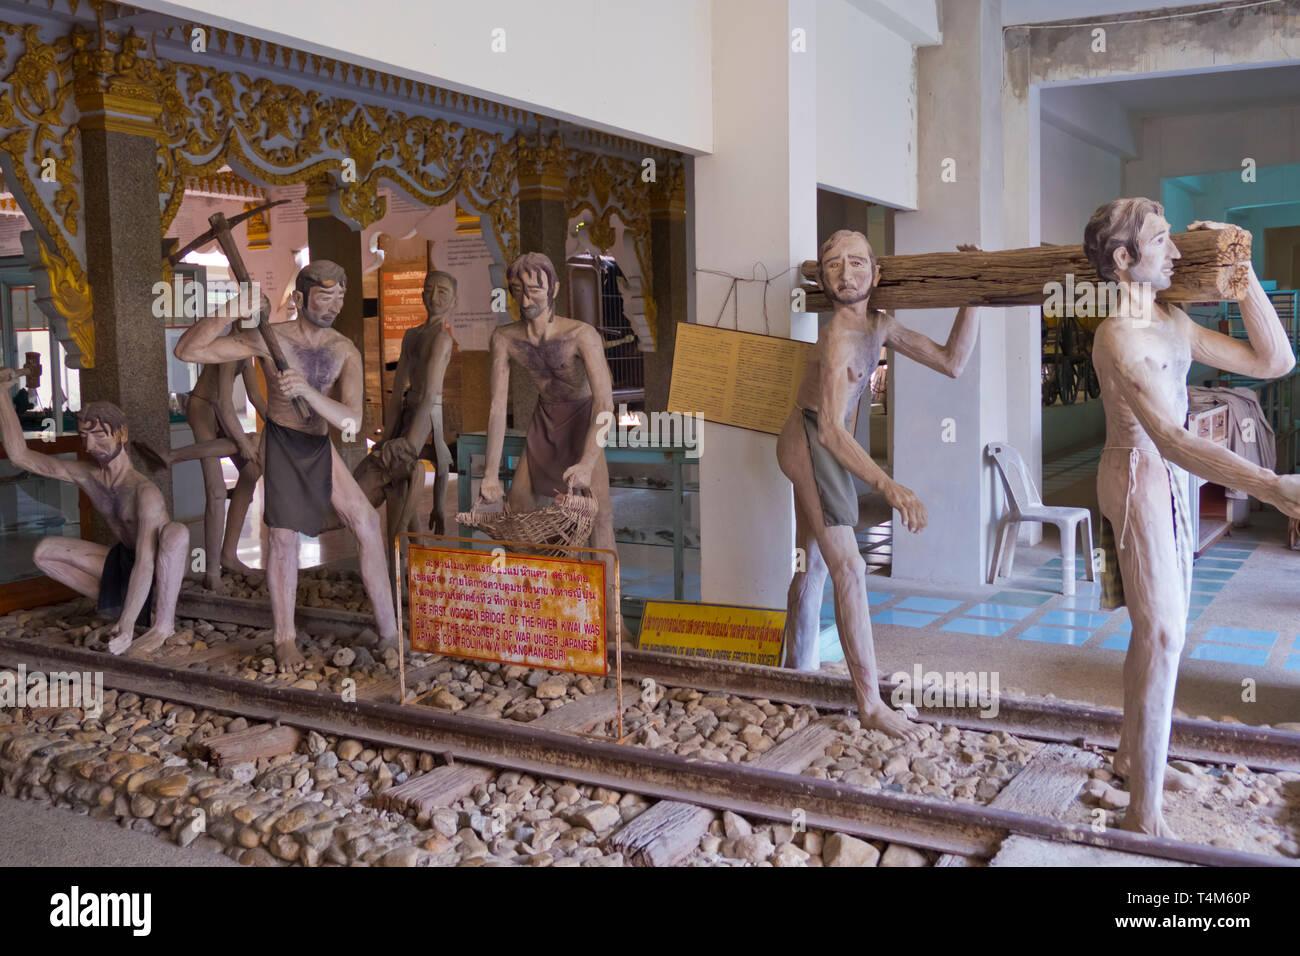 Exhibition of Allied war prisoners working on Death Railway, Jeath War Museum and World War II museum, Kanchanaburi, Thailand - Stock Image